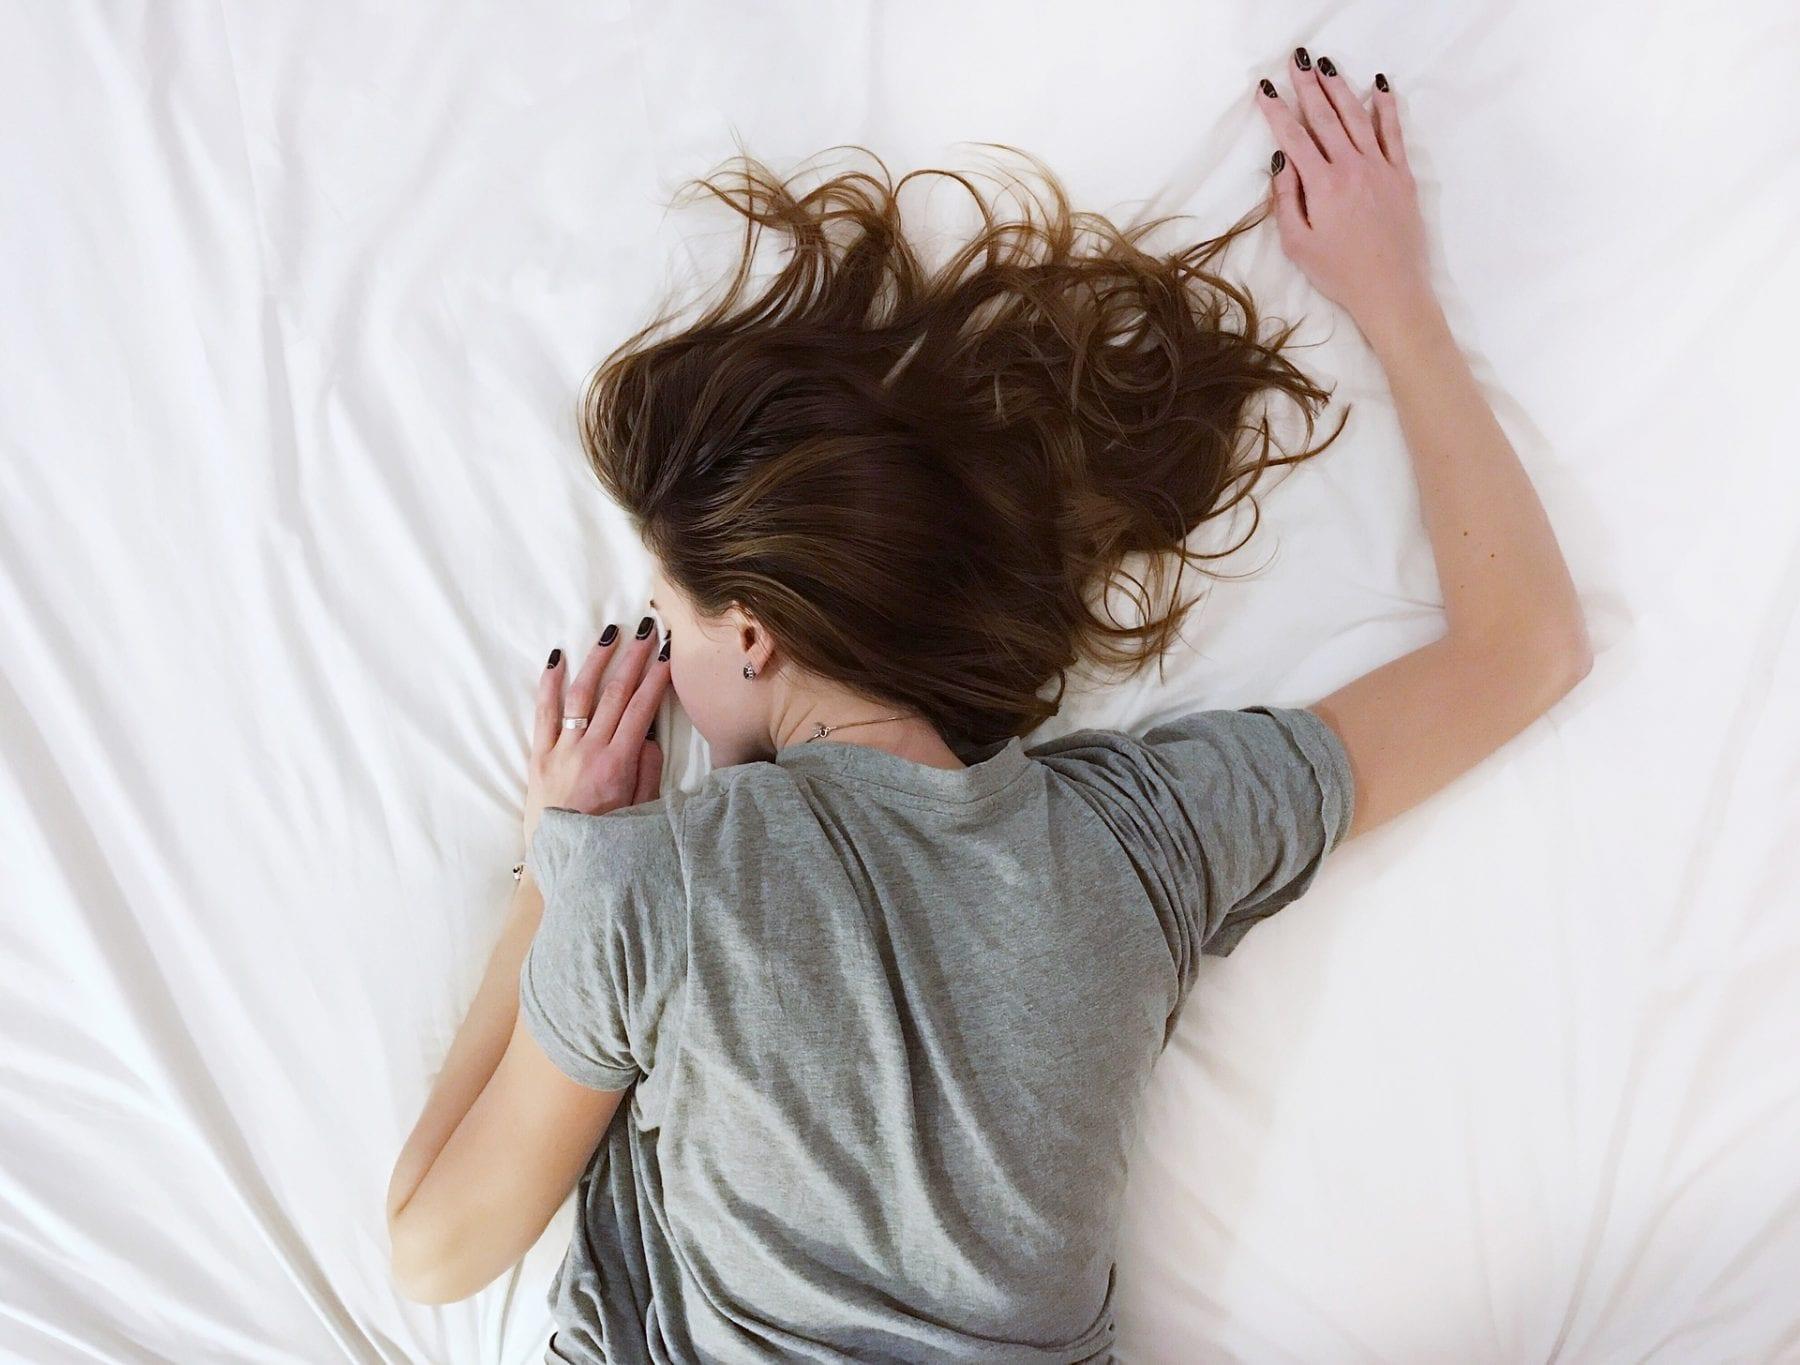 Fald hurtigere i søvn